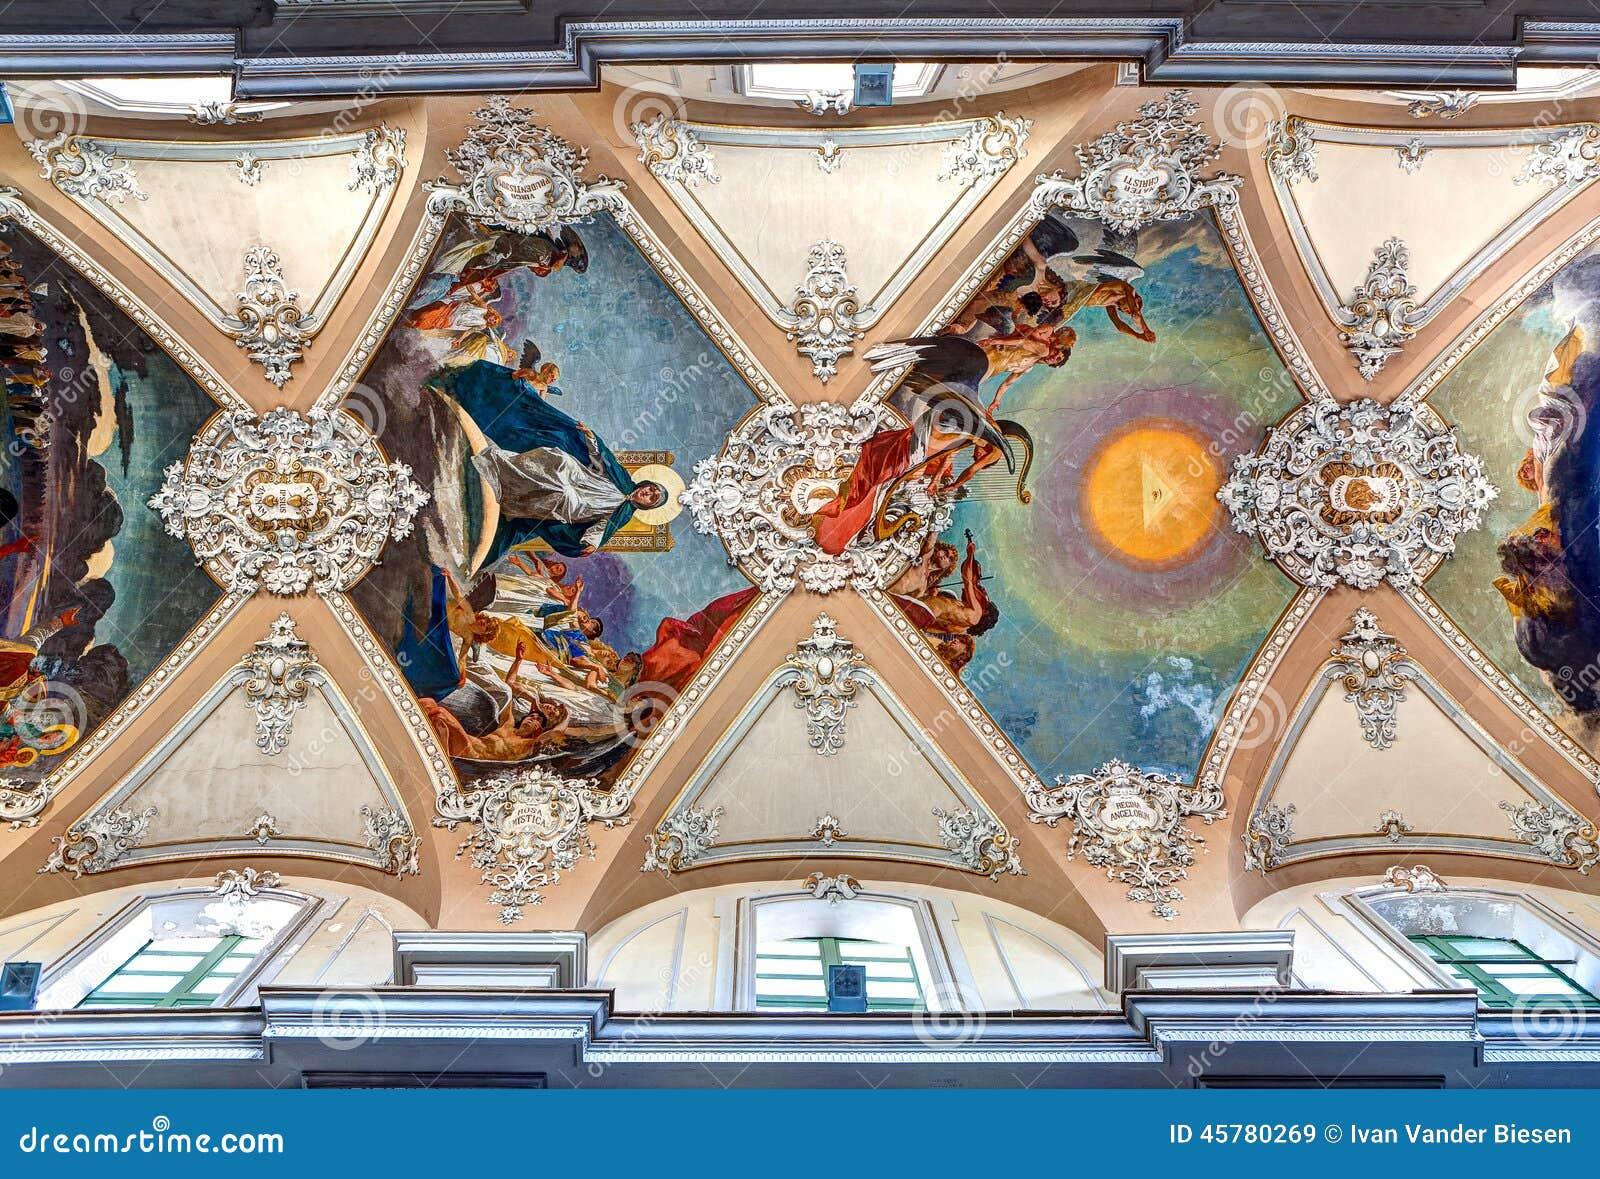 Baroque ceiling Basilica della Collegiata, Catania, Sicily, Italy